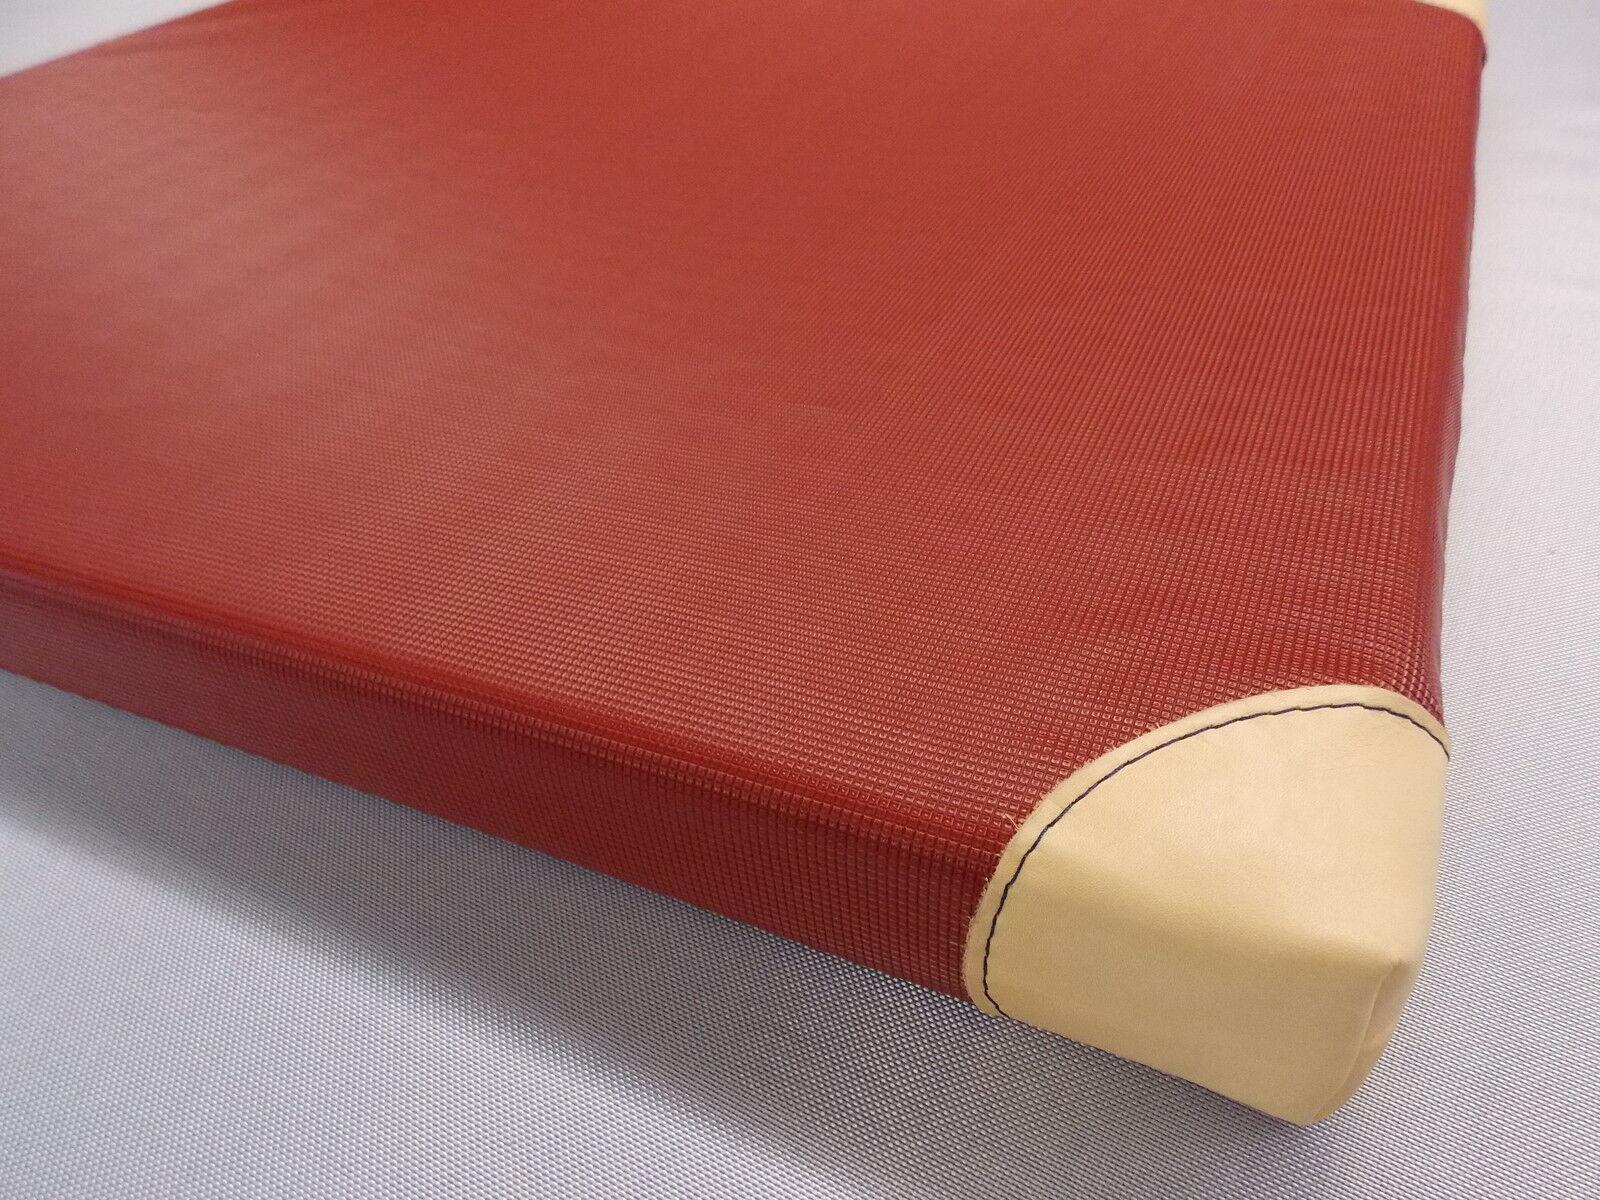 Turnmatte - Turnmatten  200x100x6 cm m. Lederecken    ROT